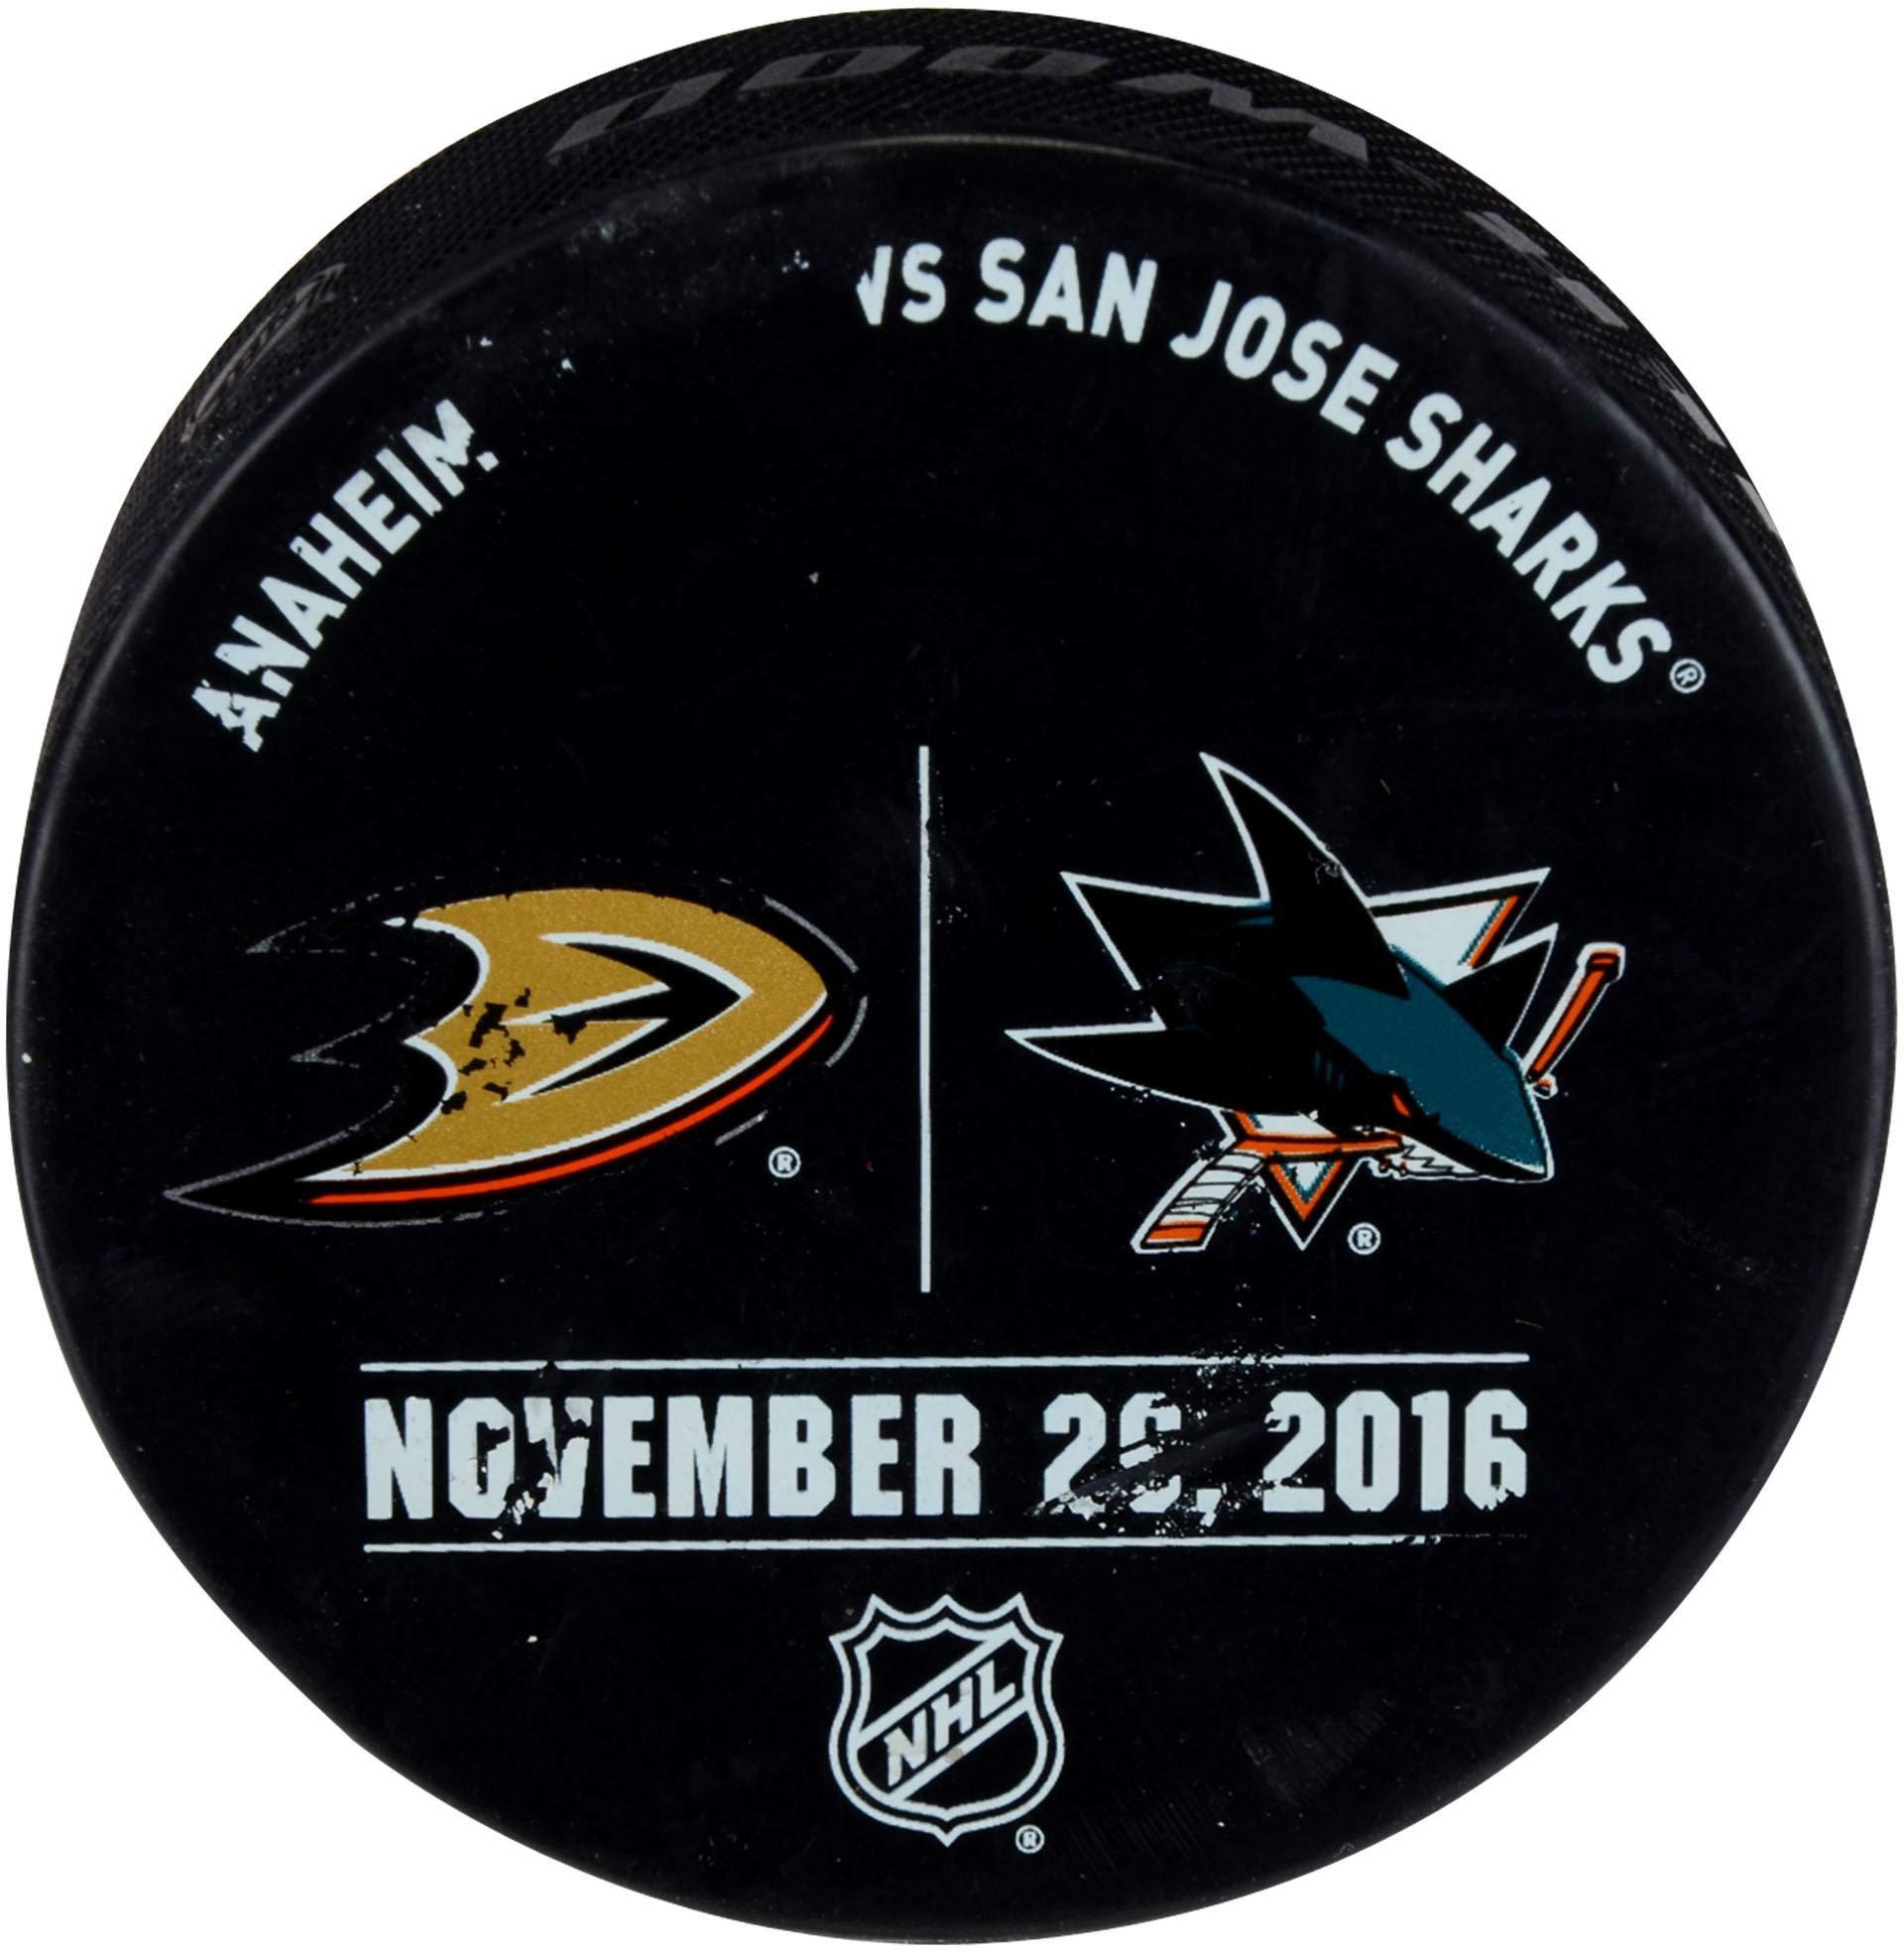 San Jose Sharks Warm up Used Puck vs. Anaheim Ducks on November 26, 2016 Fanatics Authentic Certified